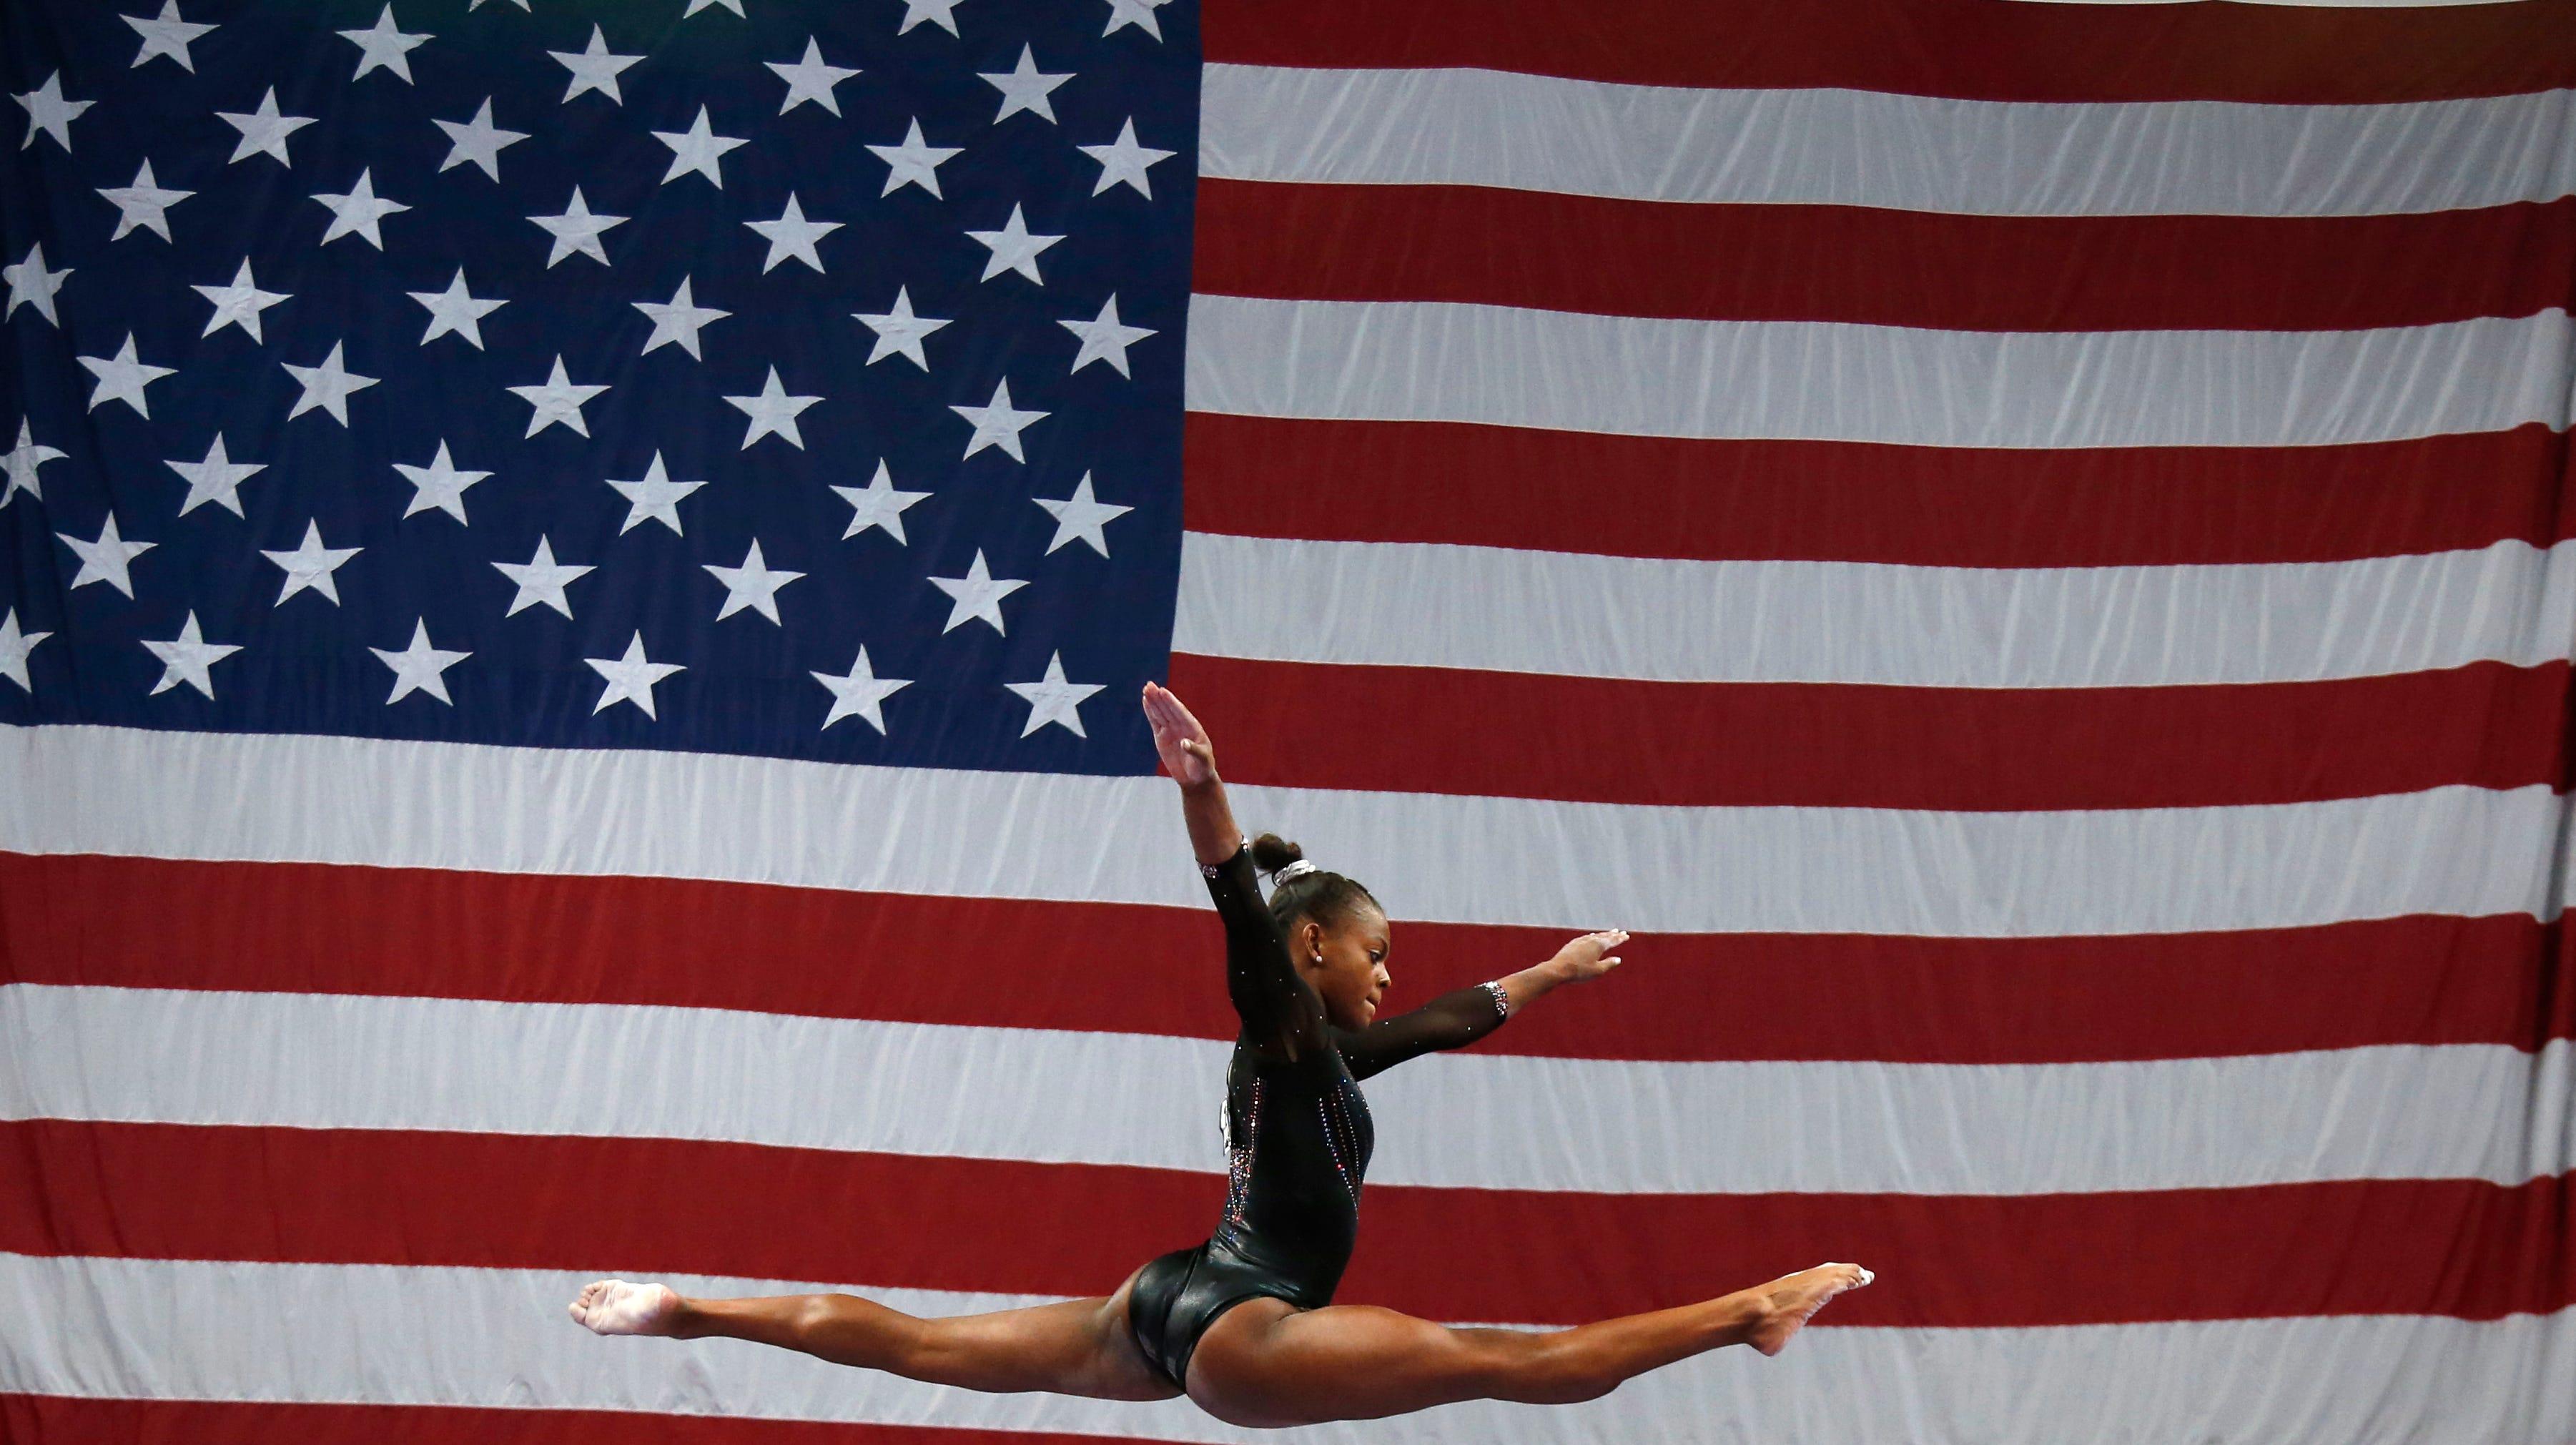 Trinity Thomas competes on the balance beam at the U.S. Gymnastics Championships, Sunday, Aug. 19, 2018, in Boston. (AP Photo/Elise Amendola)